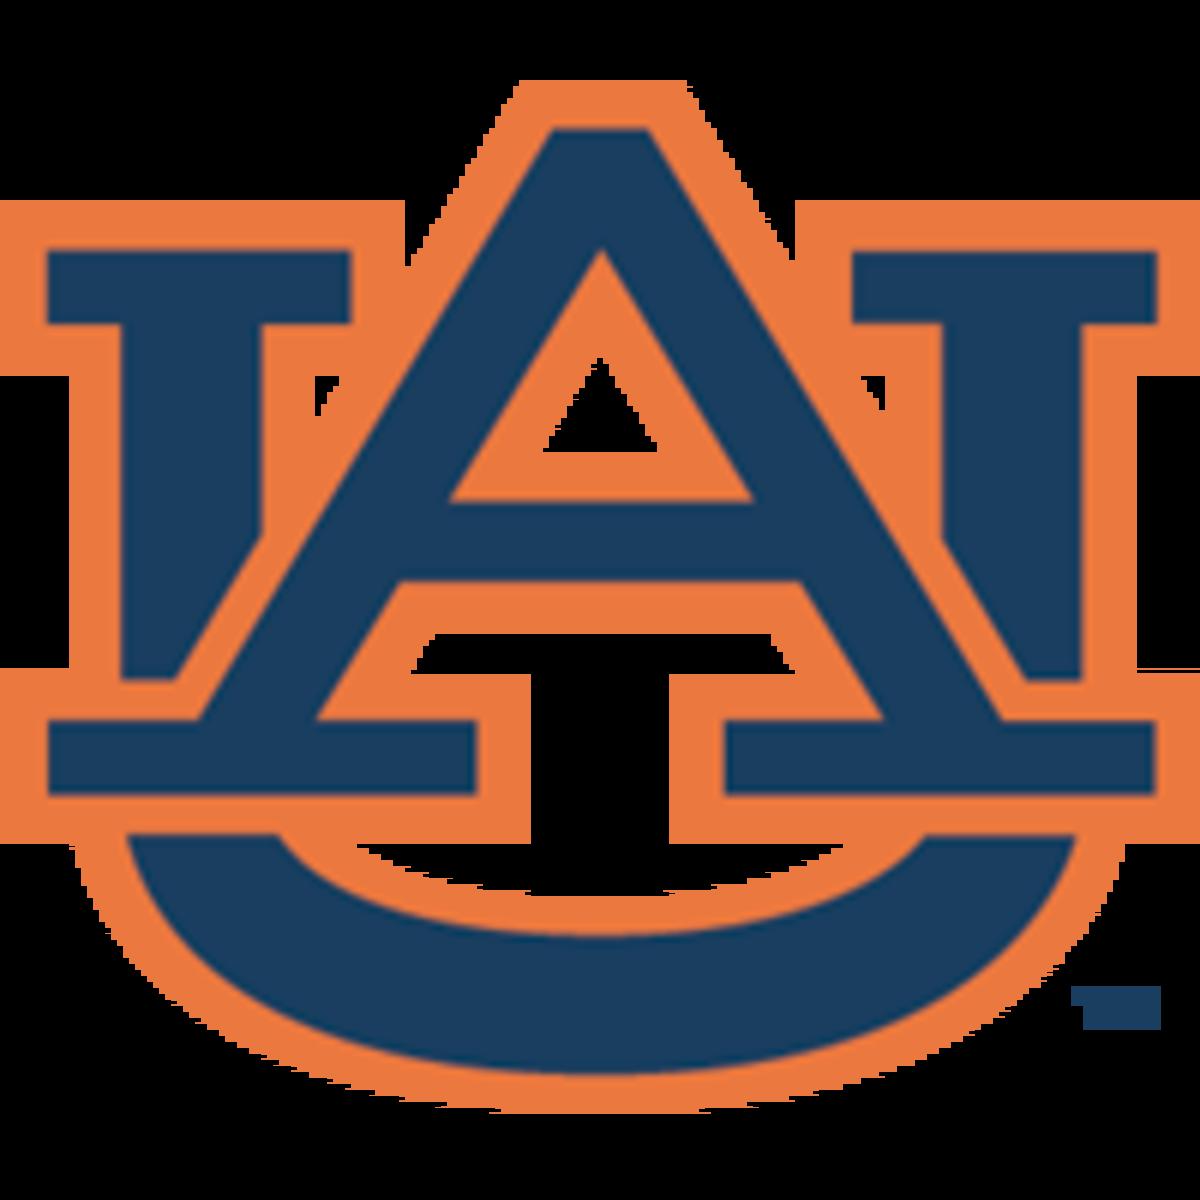 College Football Top 25 Rankings: Auburn